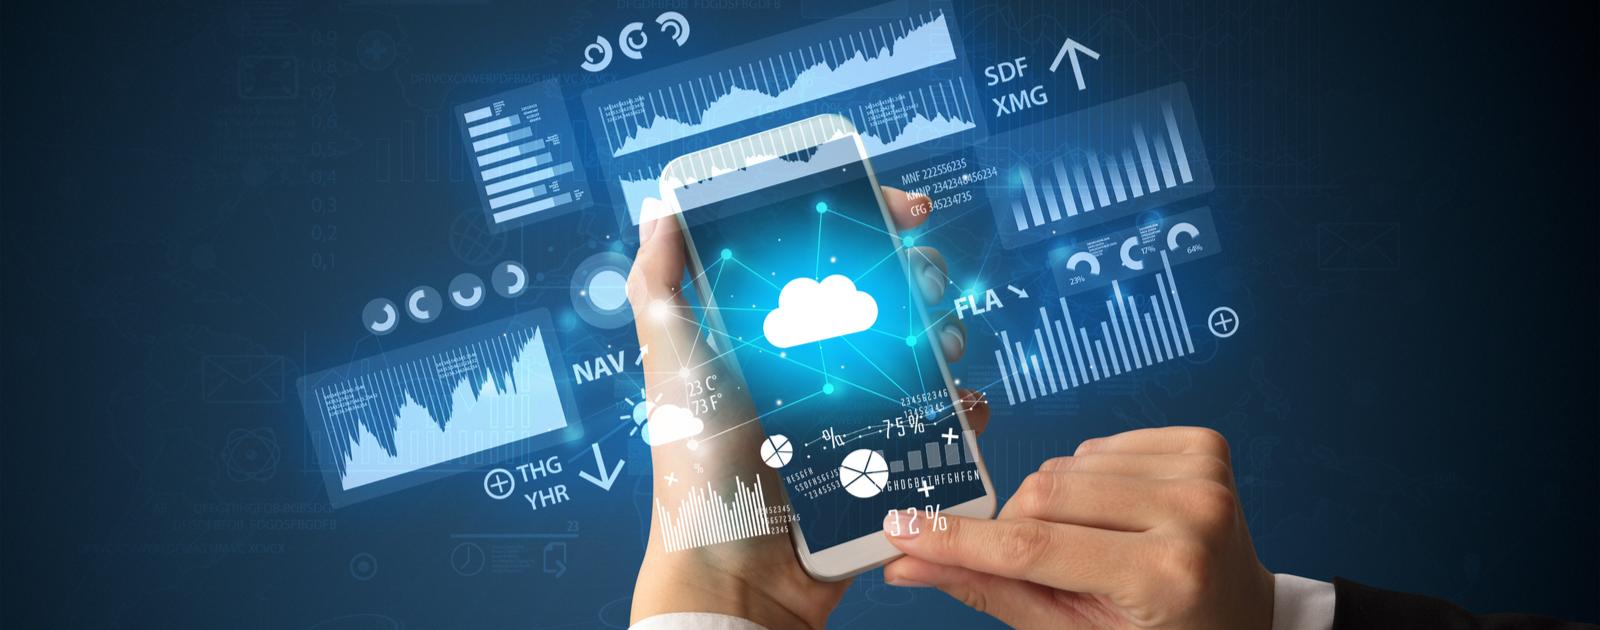 Webinar Series #34: Infor CloudSuite Distribution (CSD) Accounts Receivable (AR) Essentials